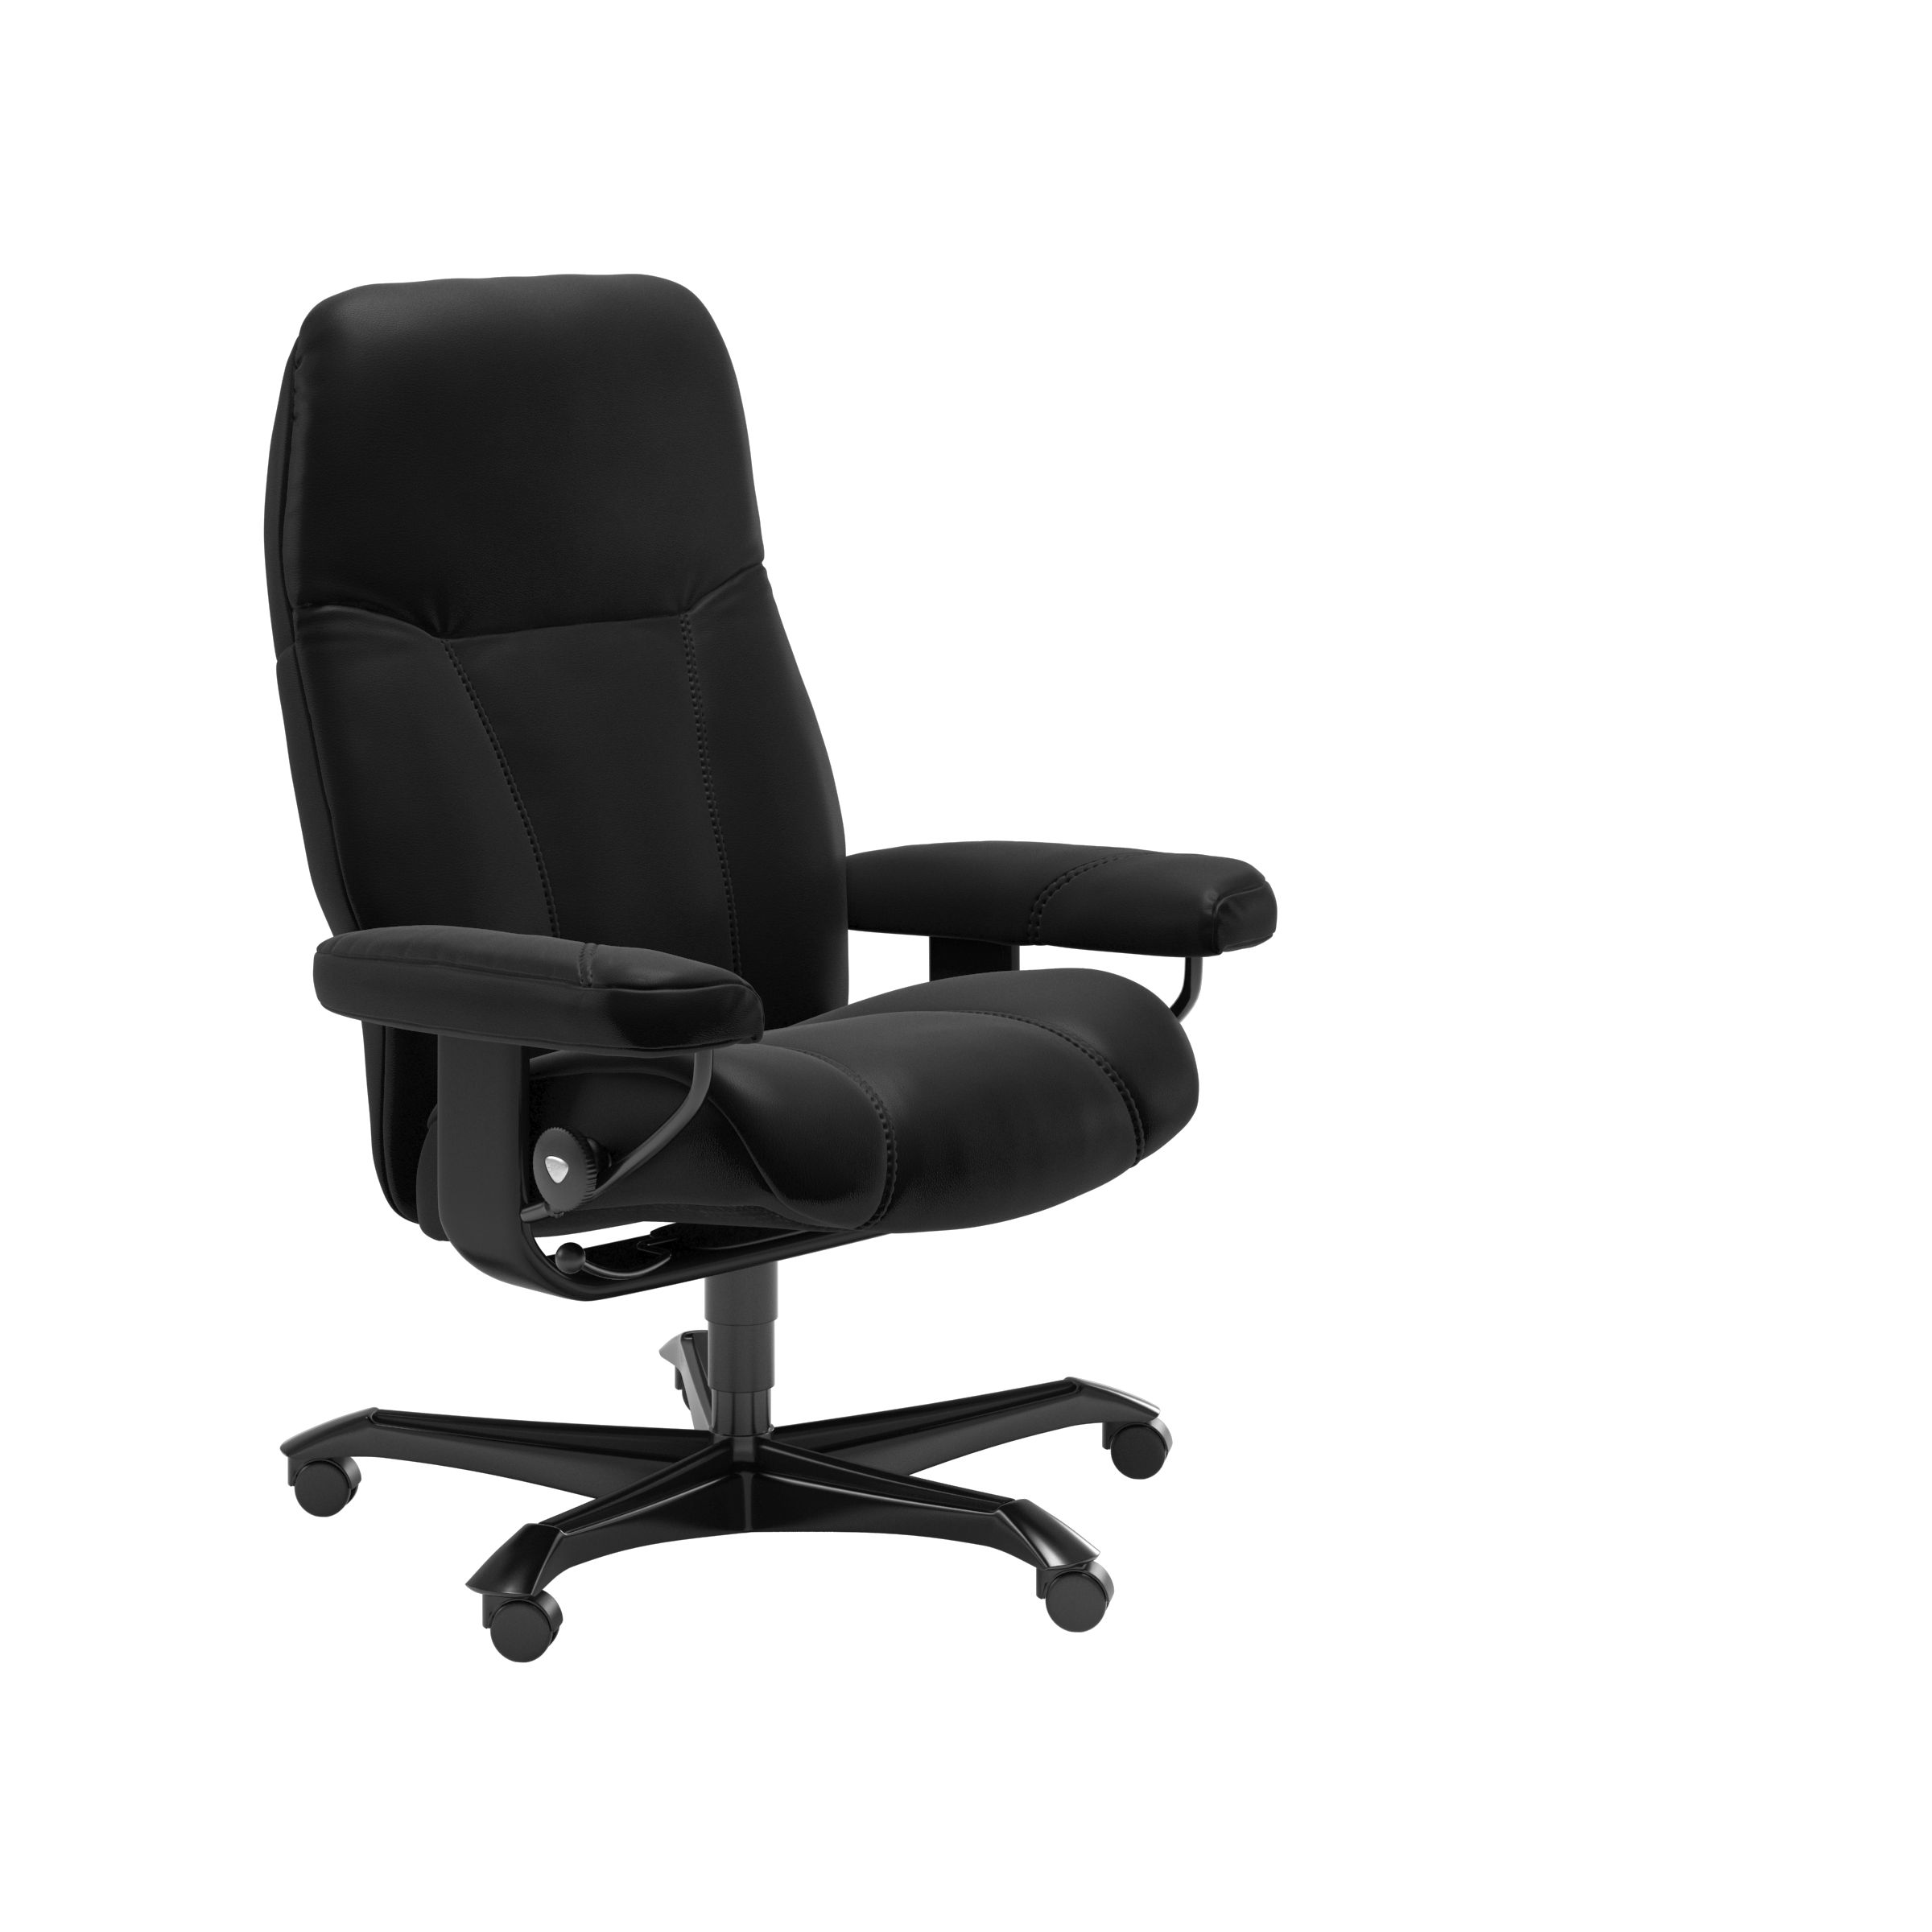 Stressless Consul Black Medium Office Chair